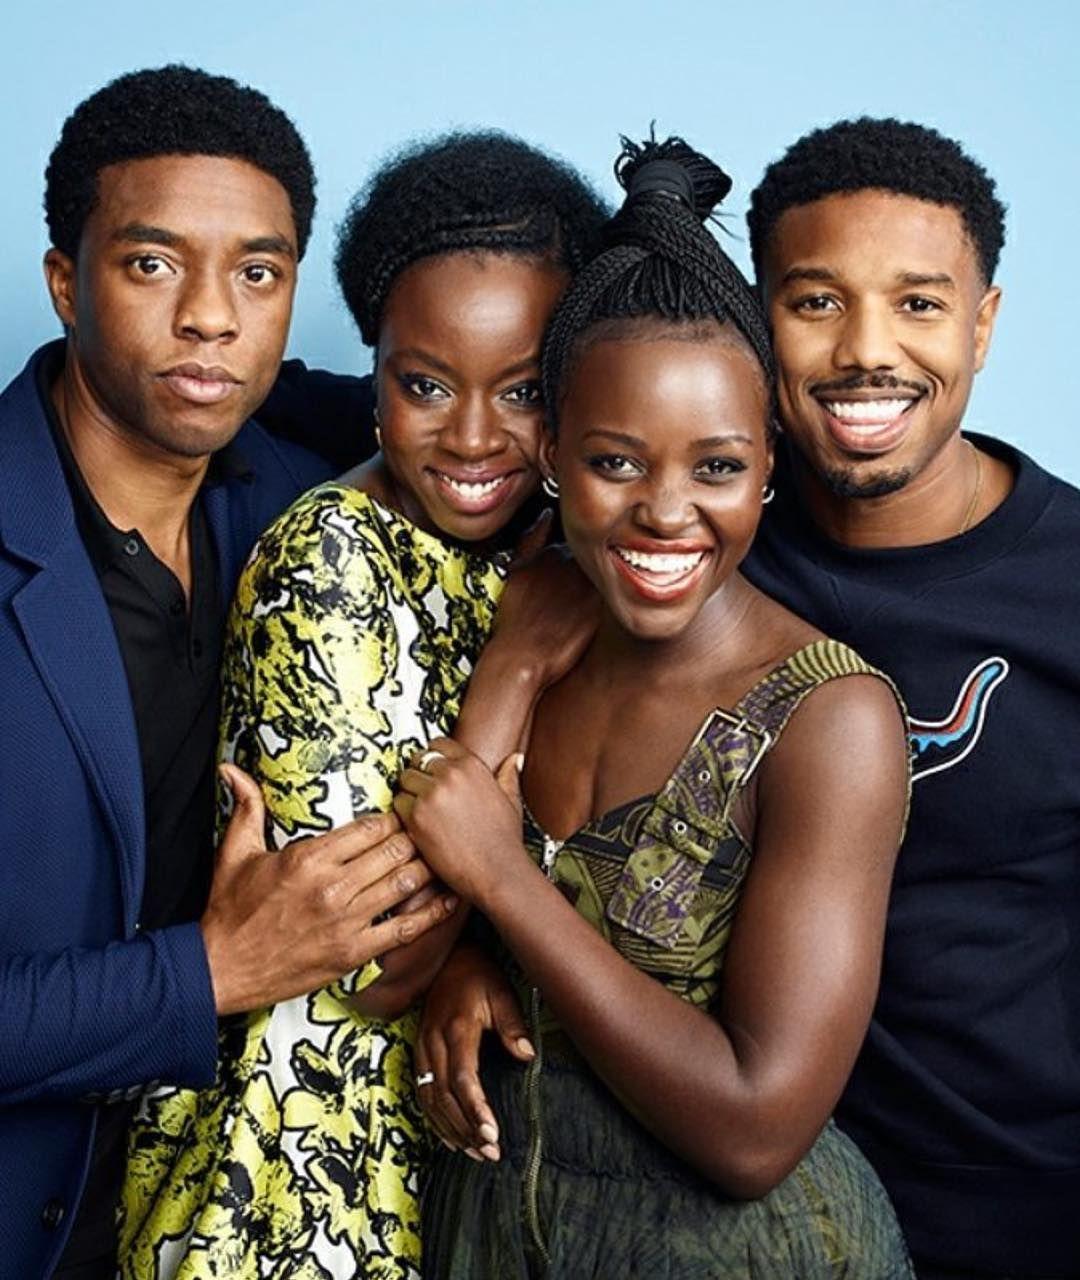 Ohana Means Family Wakanda Means Michaelbjordan Danaigurira Chadwickboseman Lupitanyongo Blac Black Panther Black Panther Party Black Panther Marvel